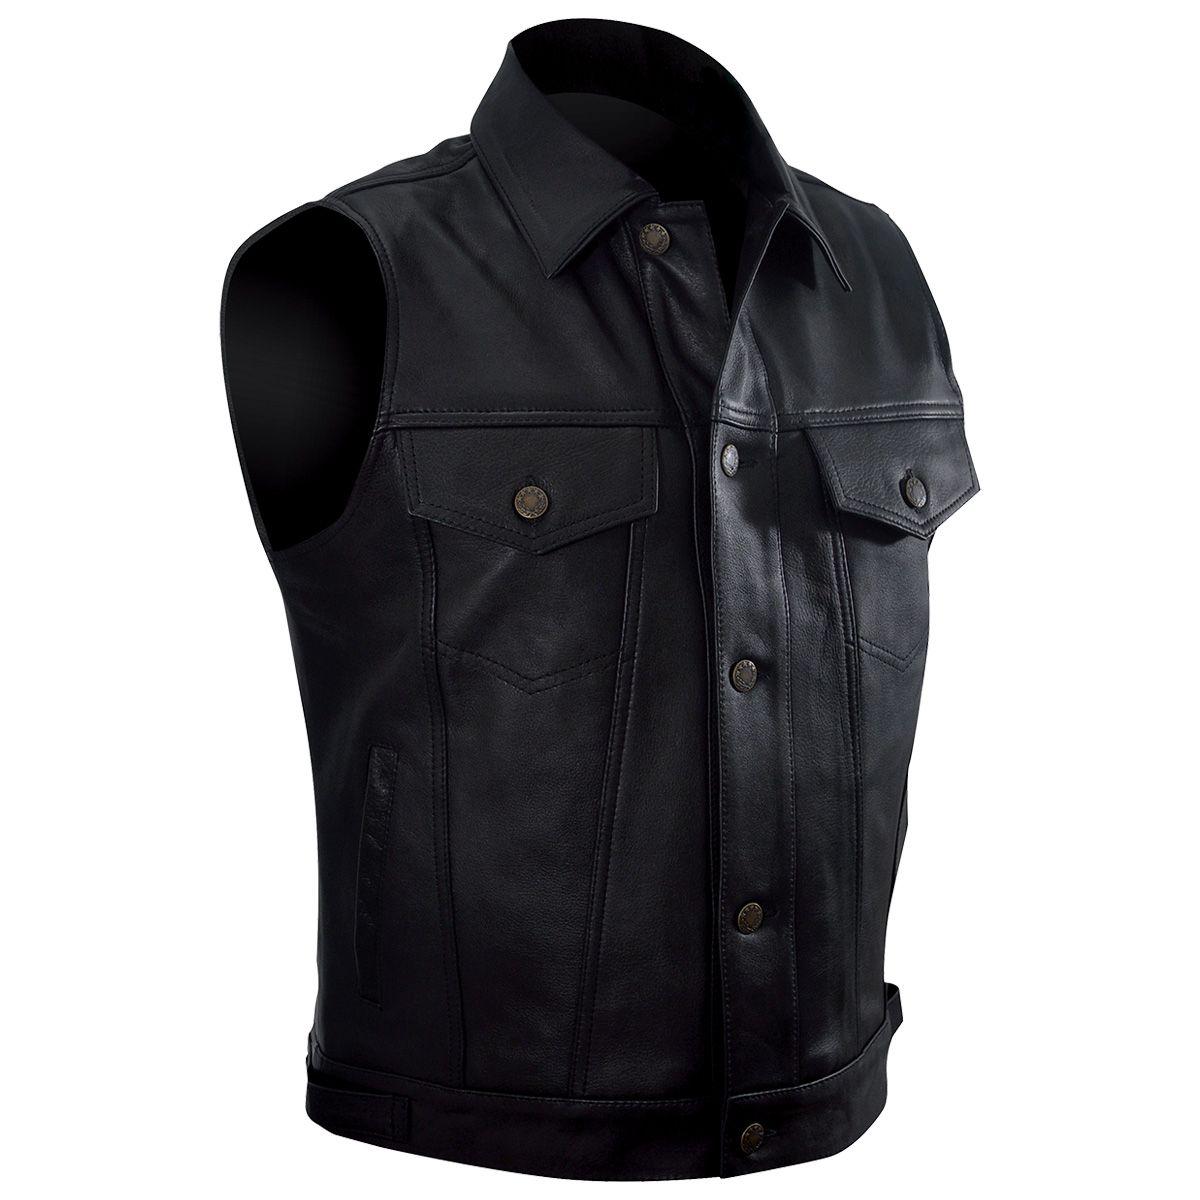 veste cuir sans manches mec osx lee jacket vestes blousons rock a gogo. Black Bedroom Furniture Sets. Home Design Ideas